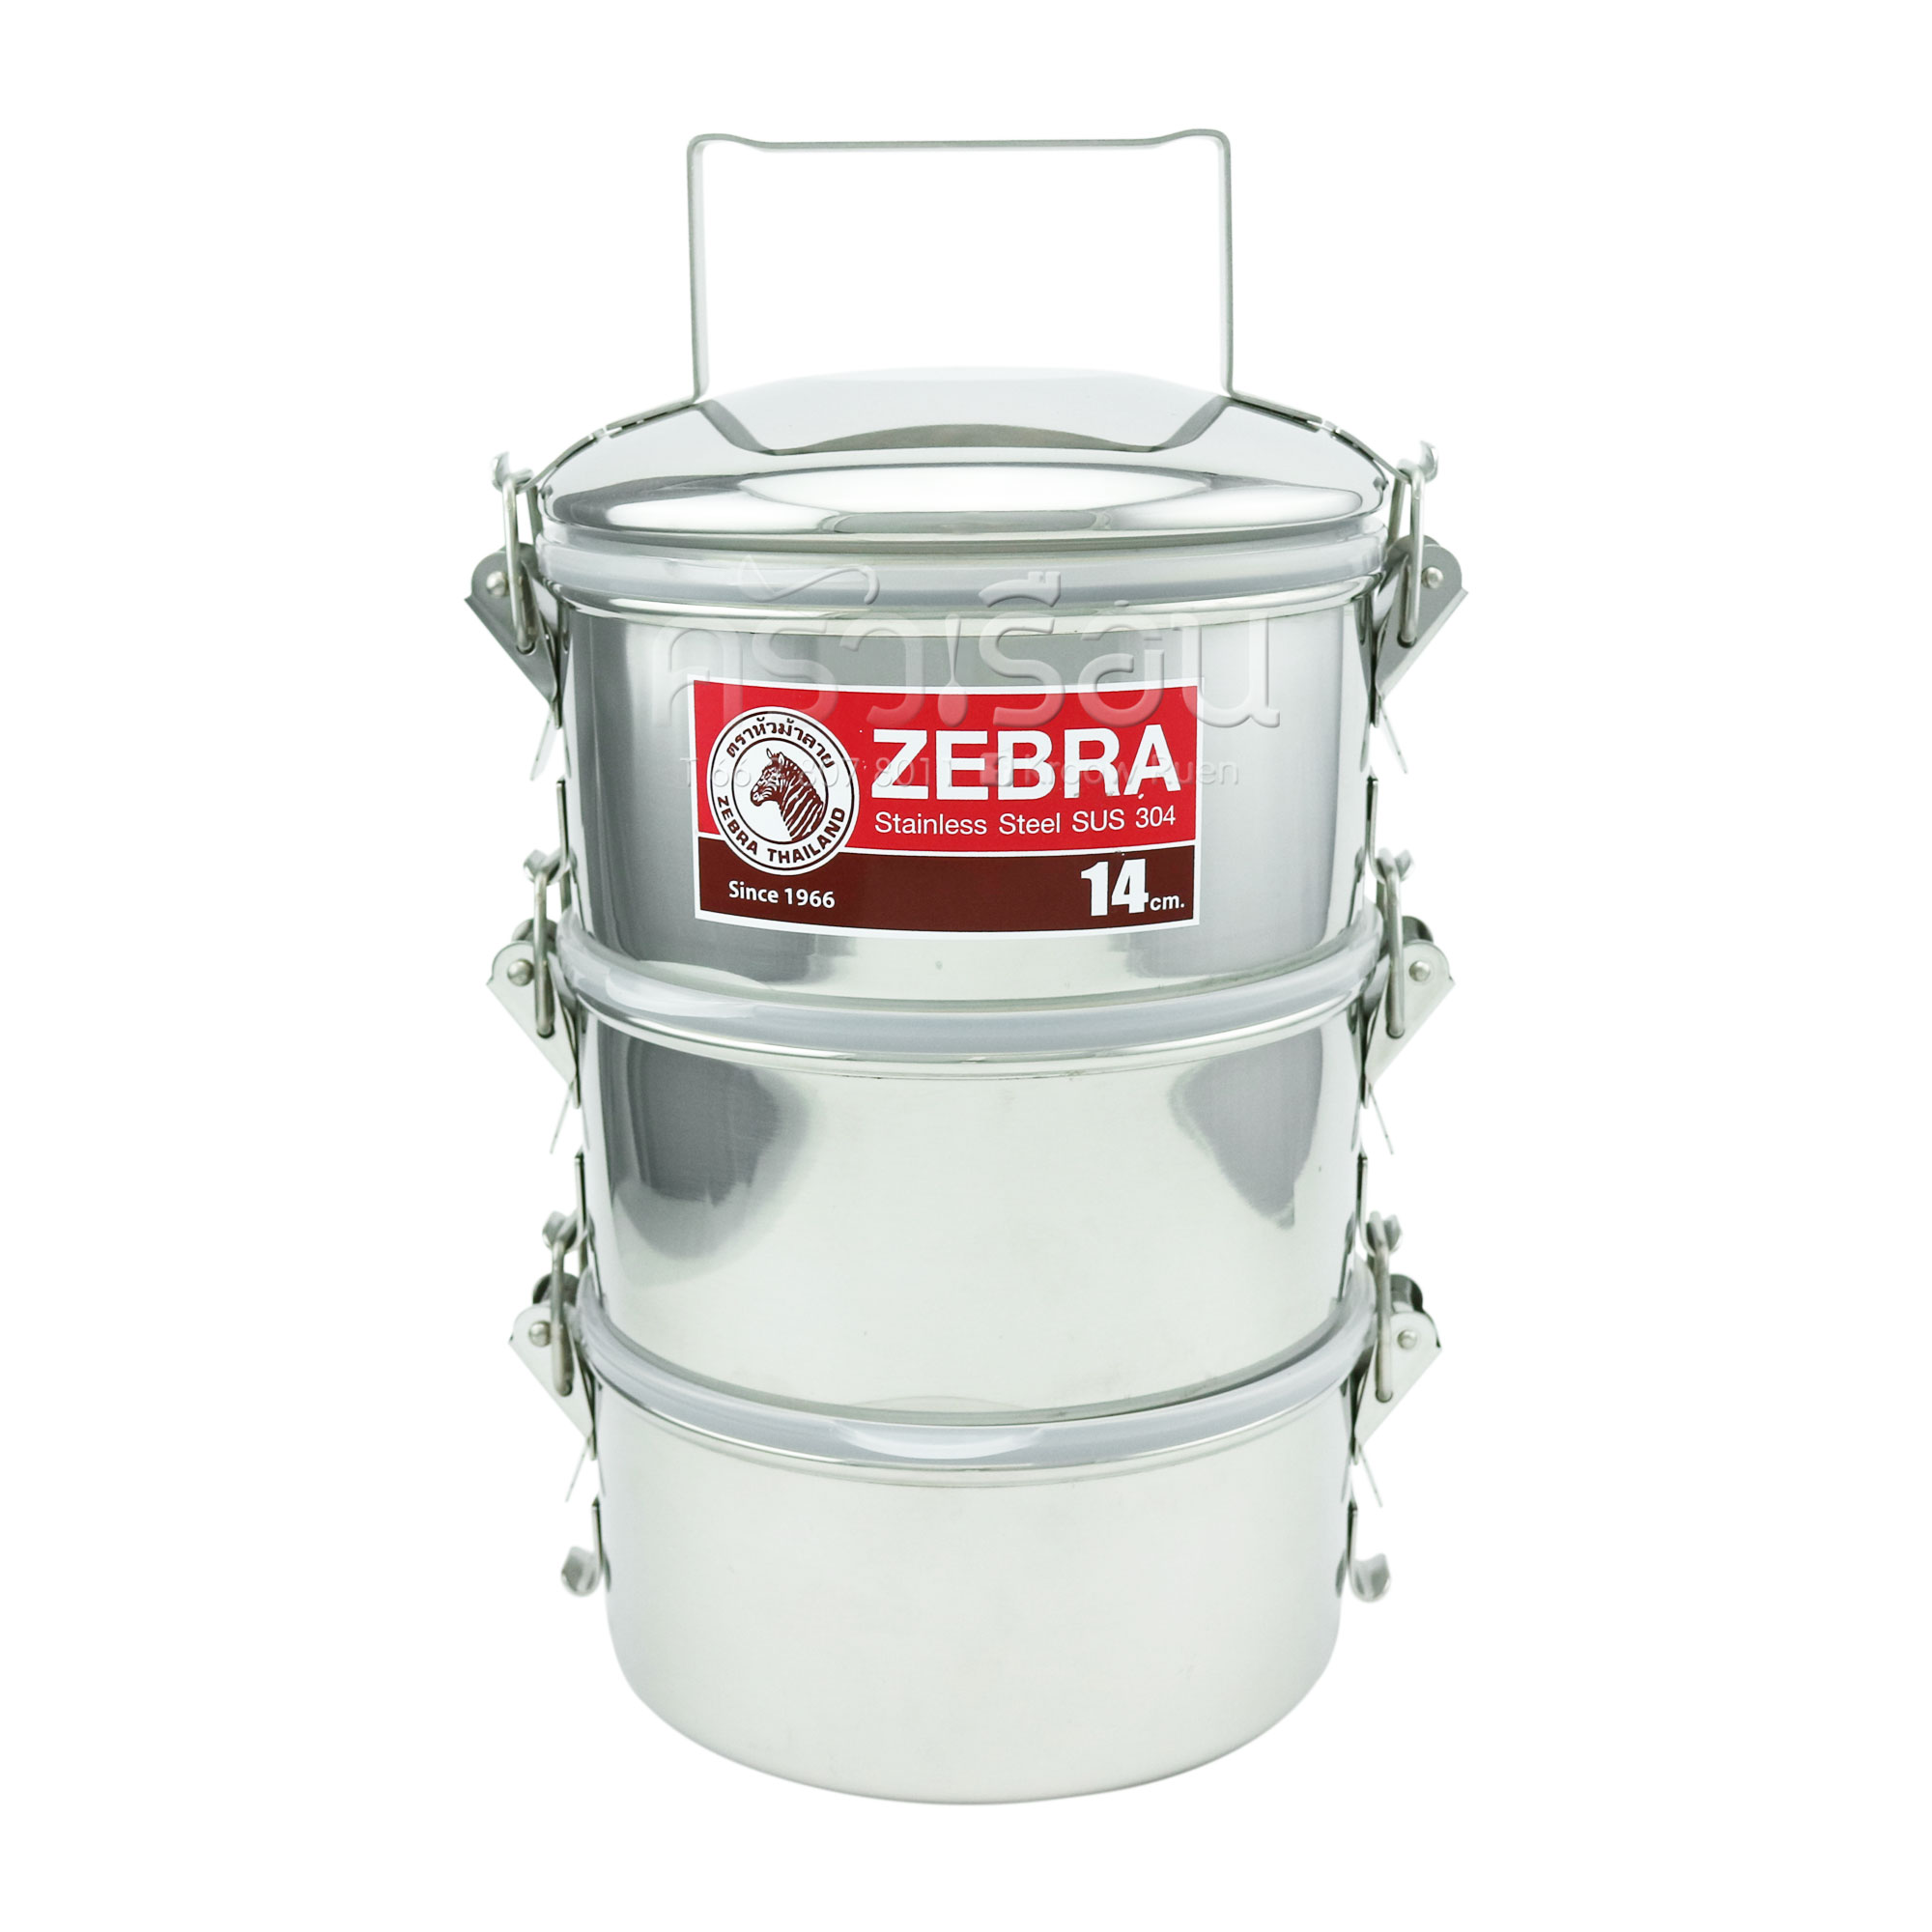 Zebra ปิ่นโตสเตนเลส รุ่น Smart Lock ตราหัวม้าลาย